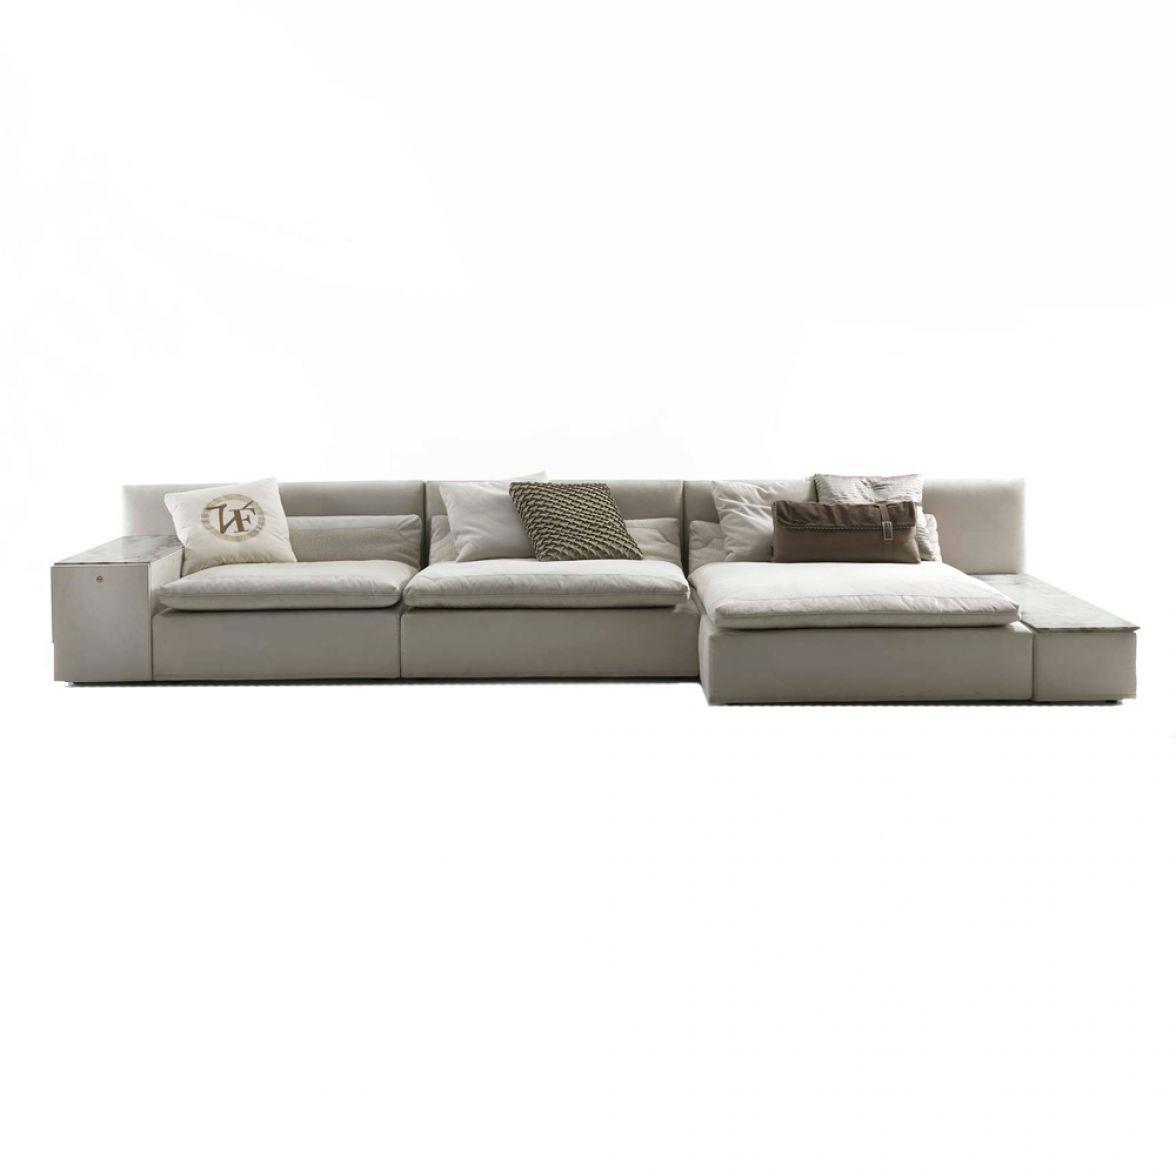 Serbelloni sofa фото цена